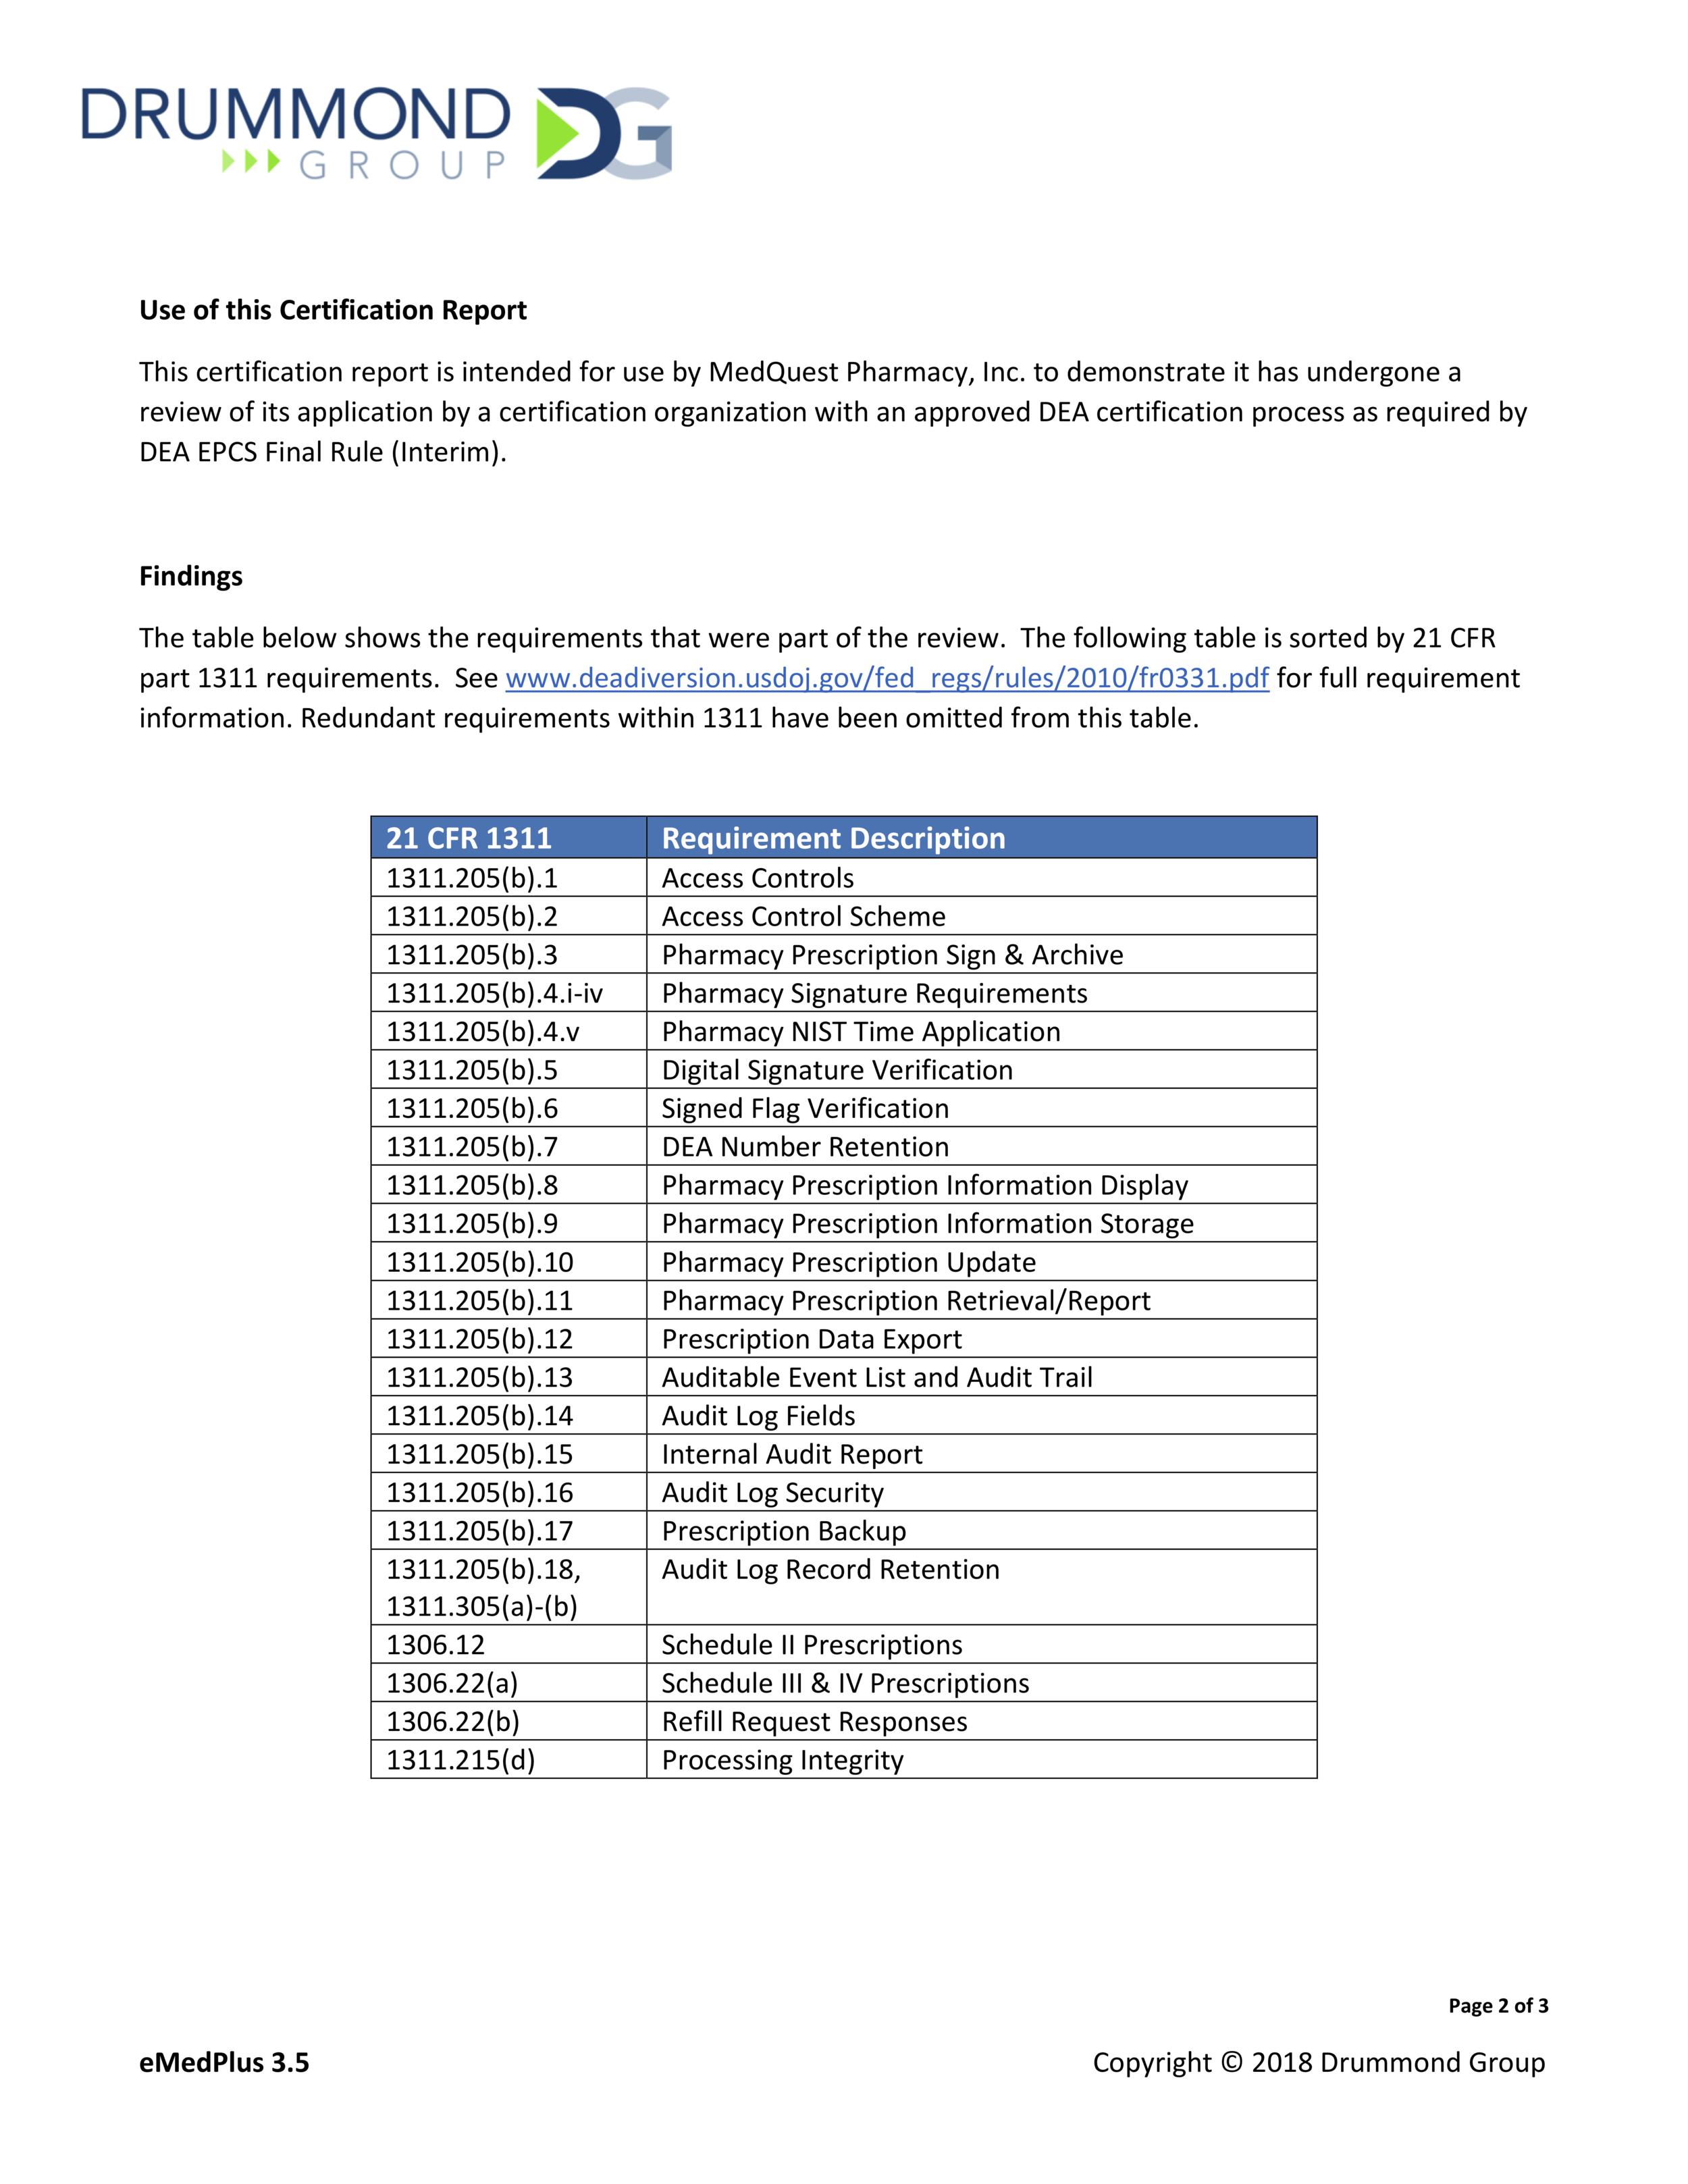 EPCS Certificate Pg. 2.png